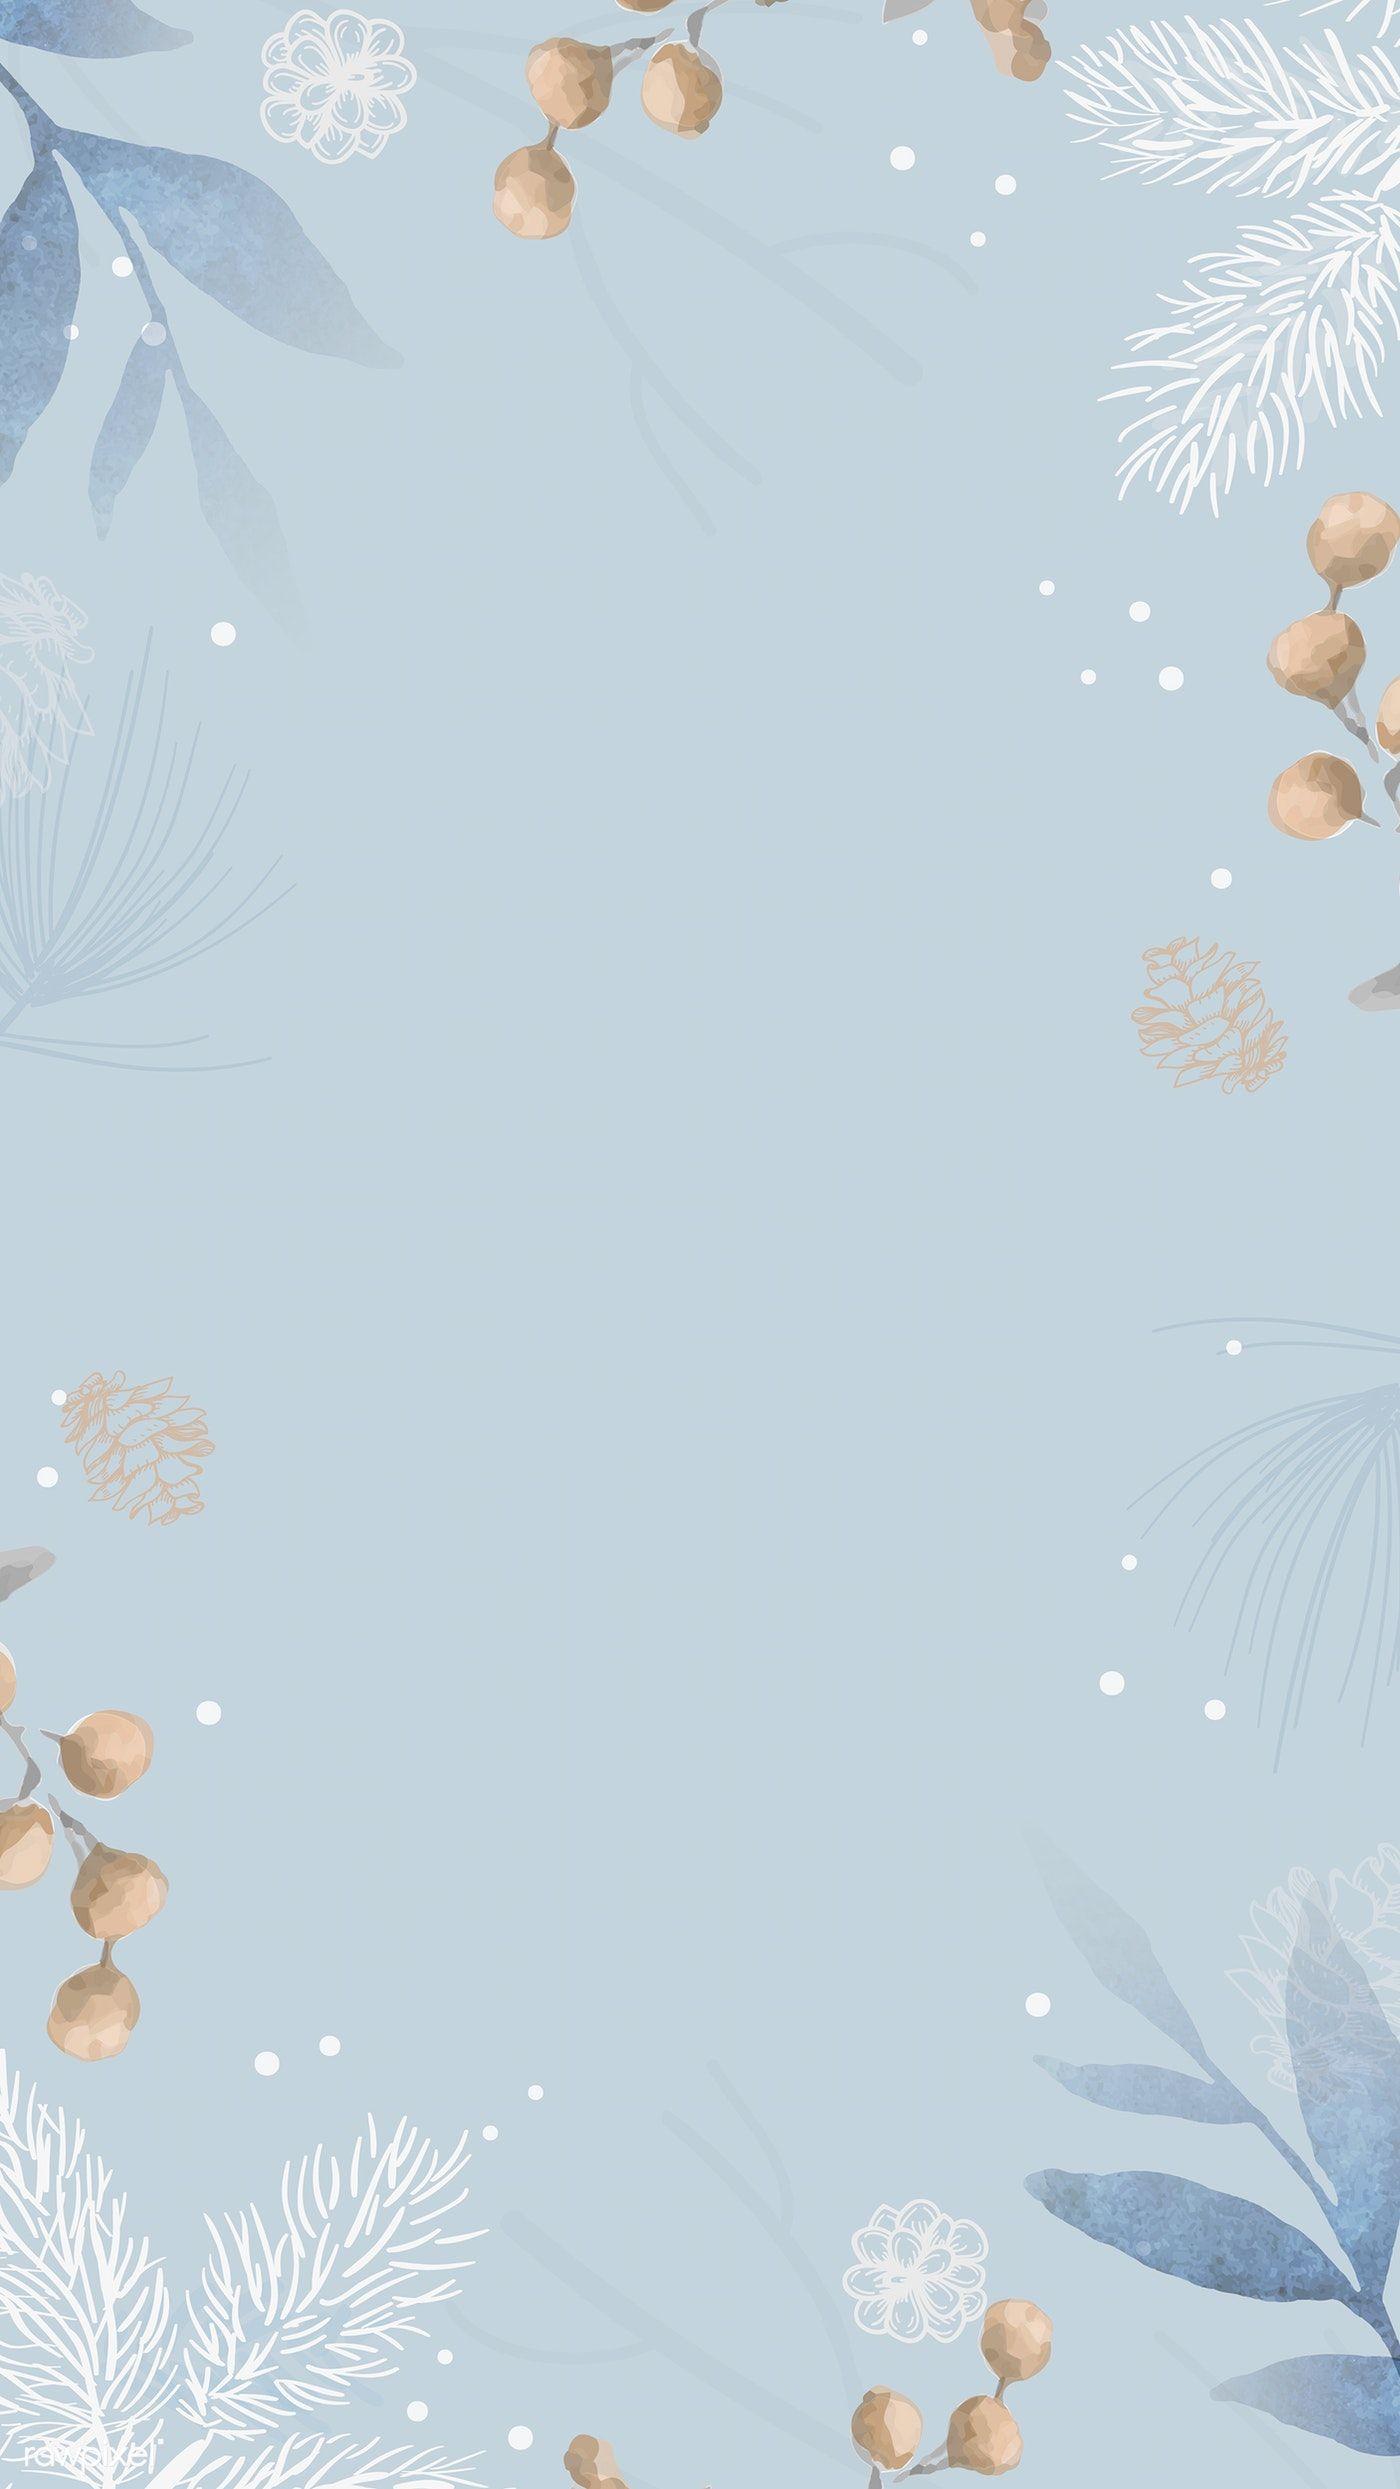 Download premium vector of Blank leafy frame mobile wallpaper vector